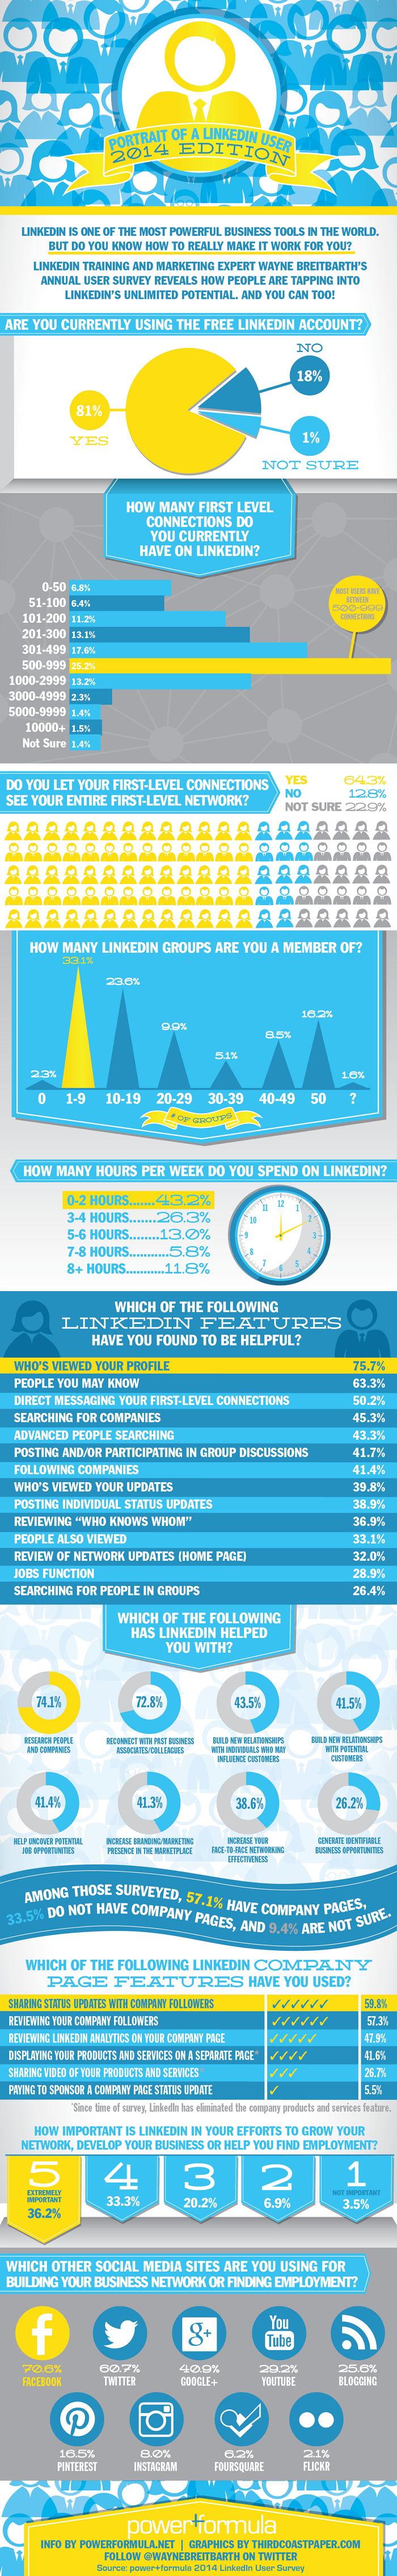 linkedin-how-users